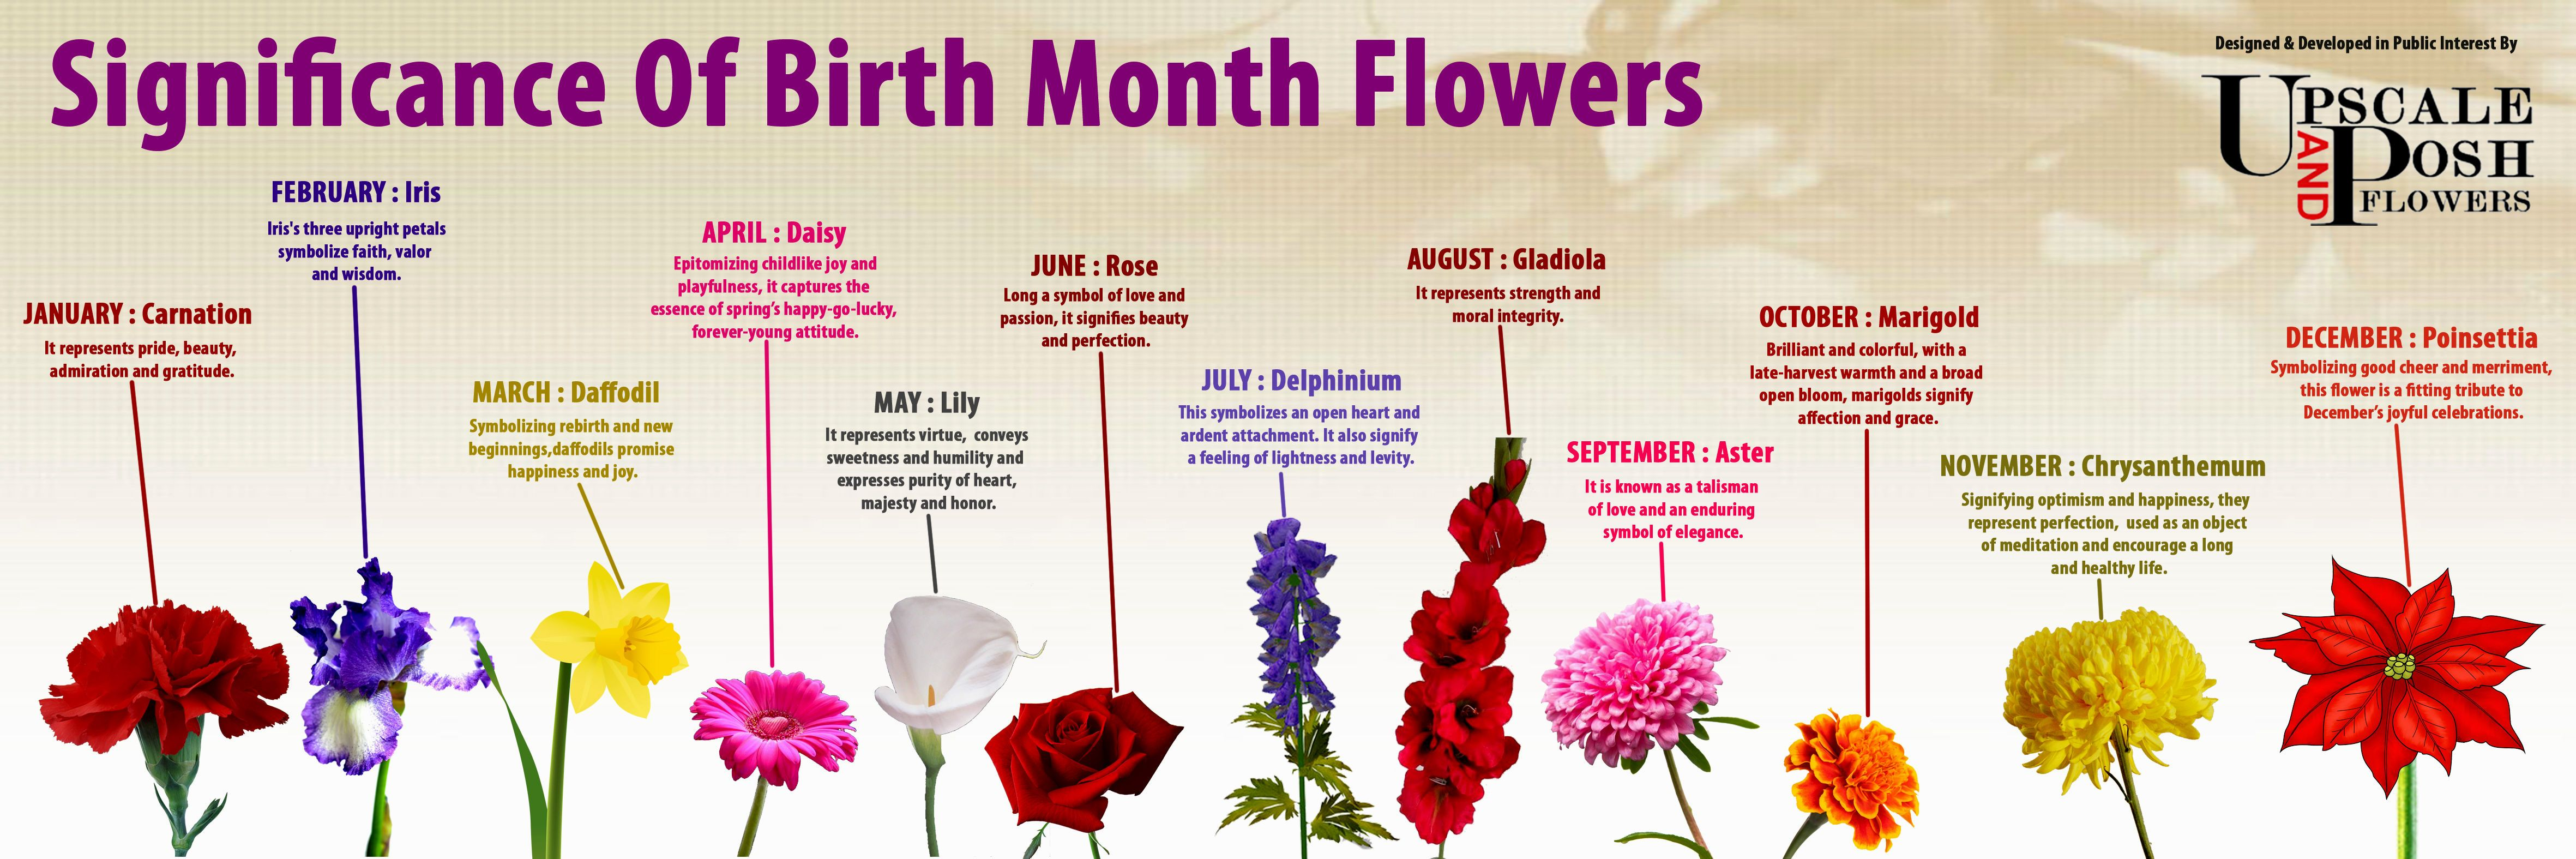 Birth Month Flowers Meaning Tattoo Inspiration Pinterest Birth